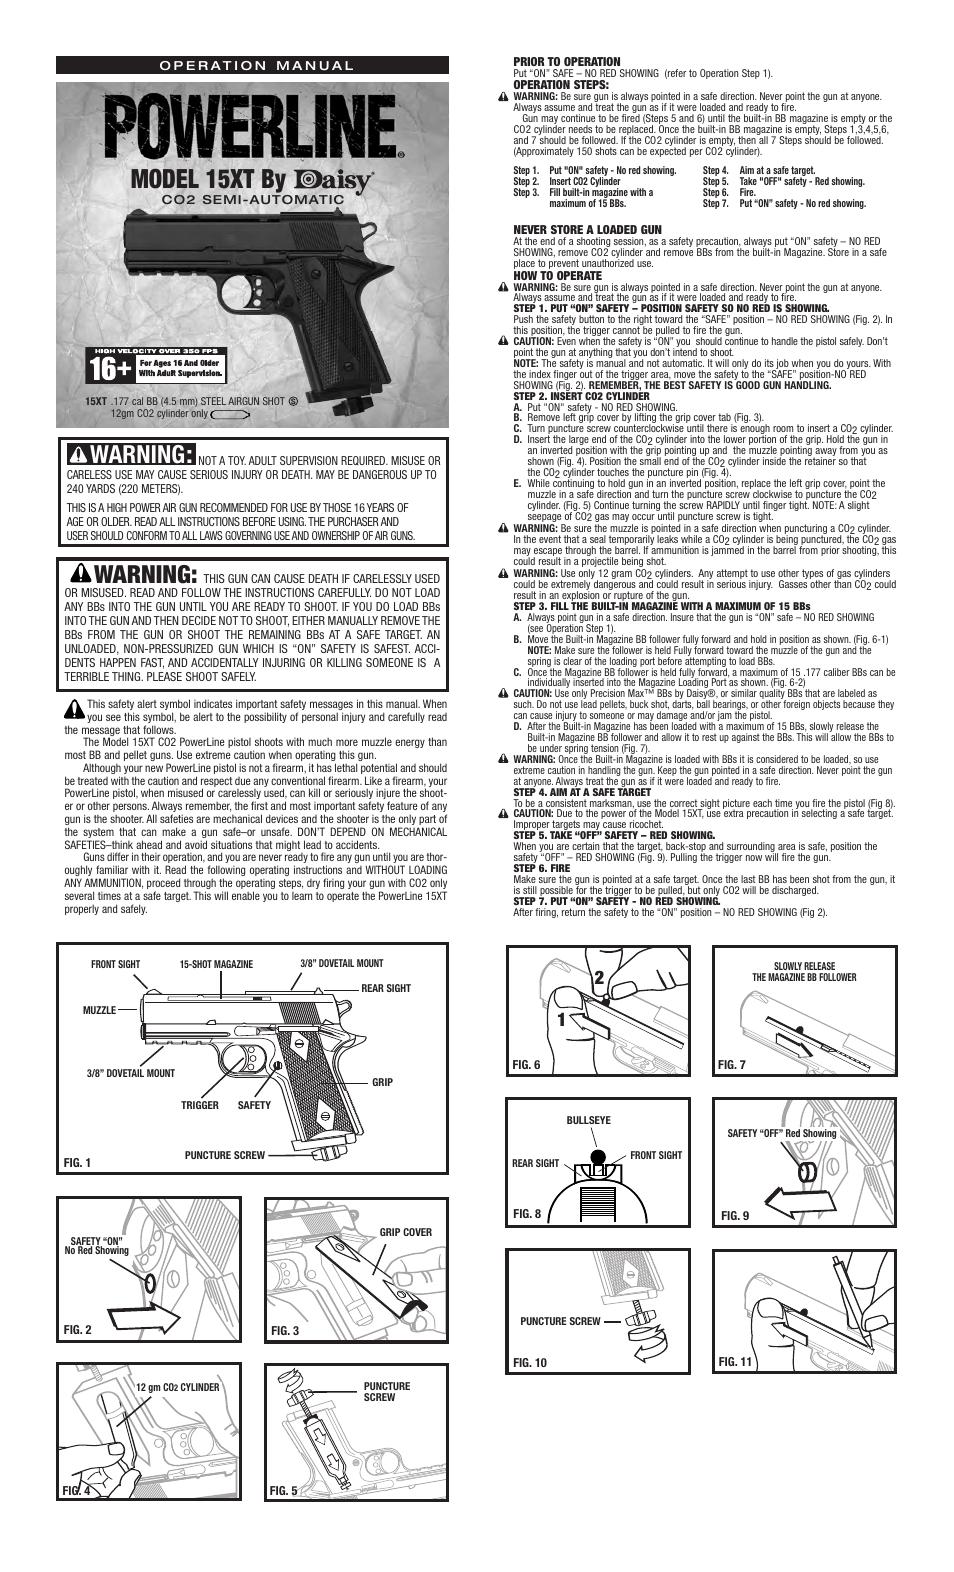 Daisy Powerline 15xtp User Manual